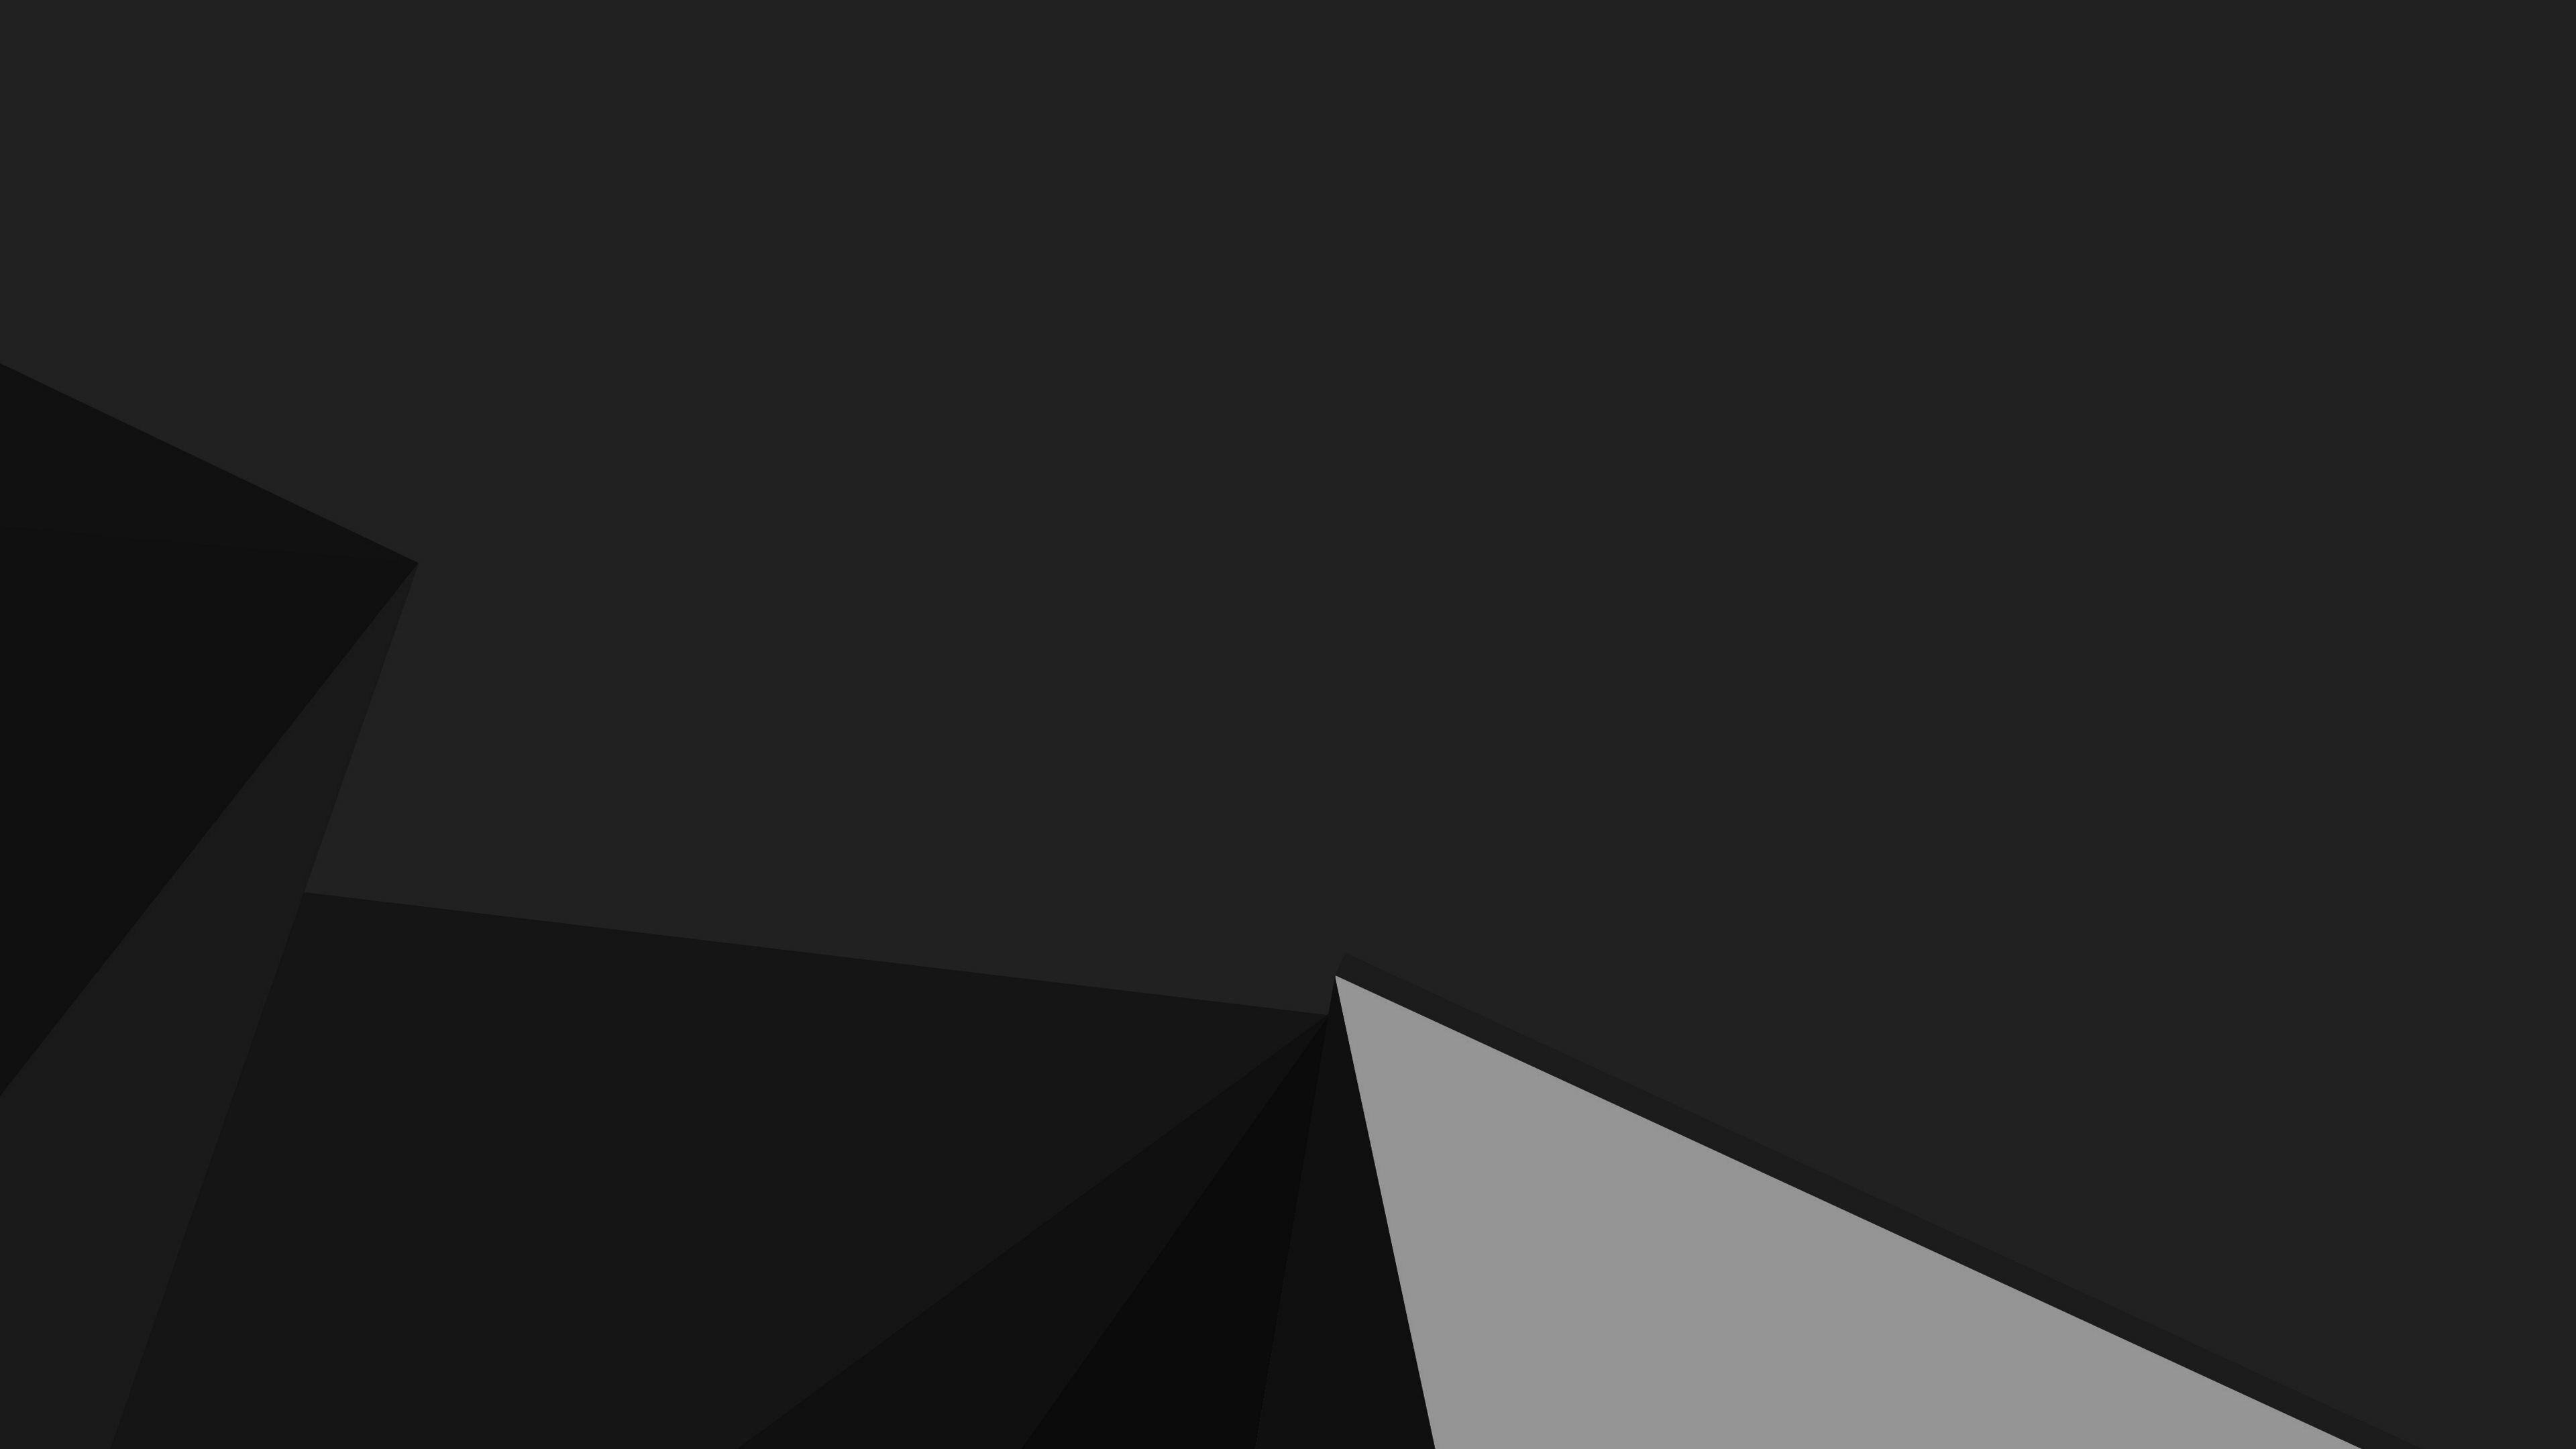 4k Flat Wallpapers Top Free 4k Flat Backgrounds